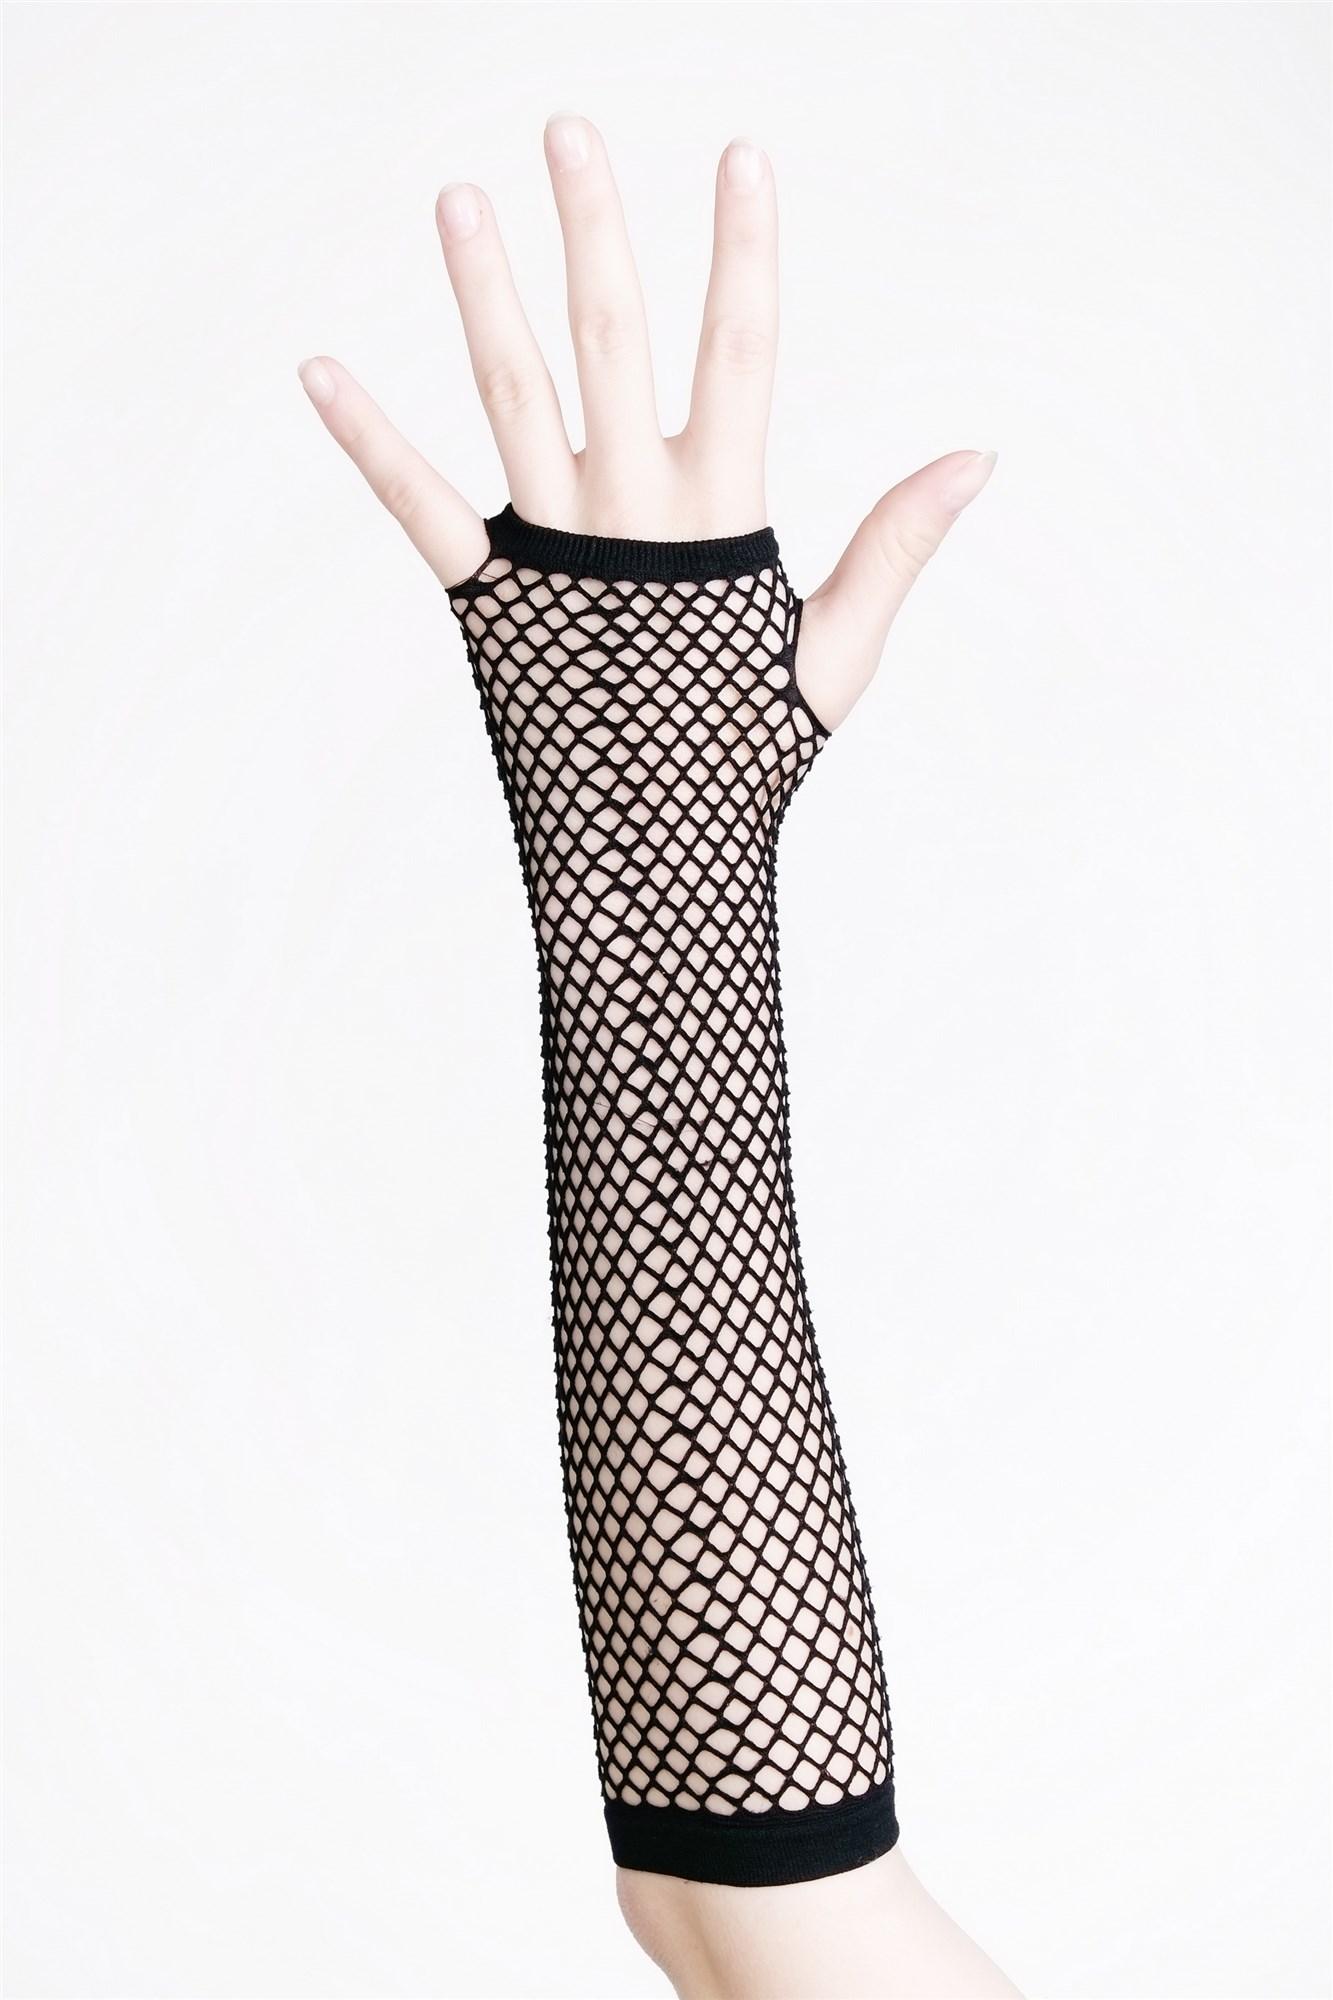 Karneval Handschuhe Netzhandschuhe Fishnet Neon Grün Punk Wave Goth 80er Z065